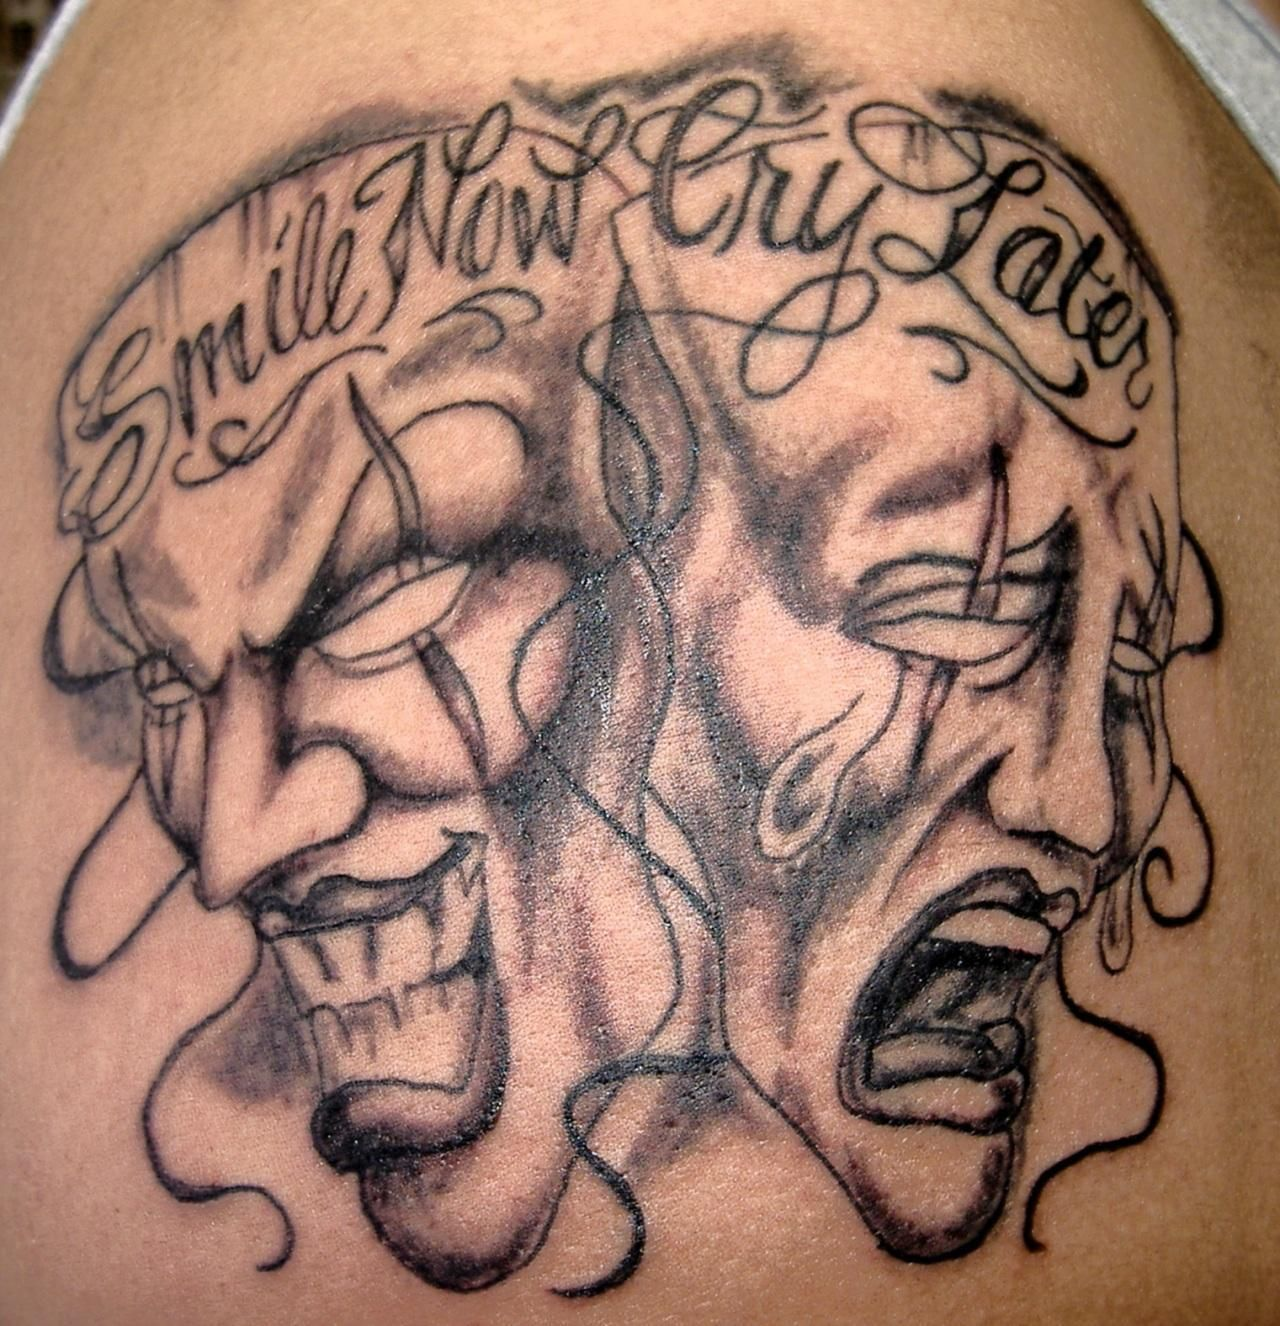 Tatuaje chicano pinterest tattoo clown tattoo for Chicano tattoos meanings